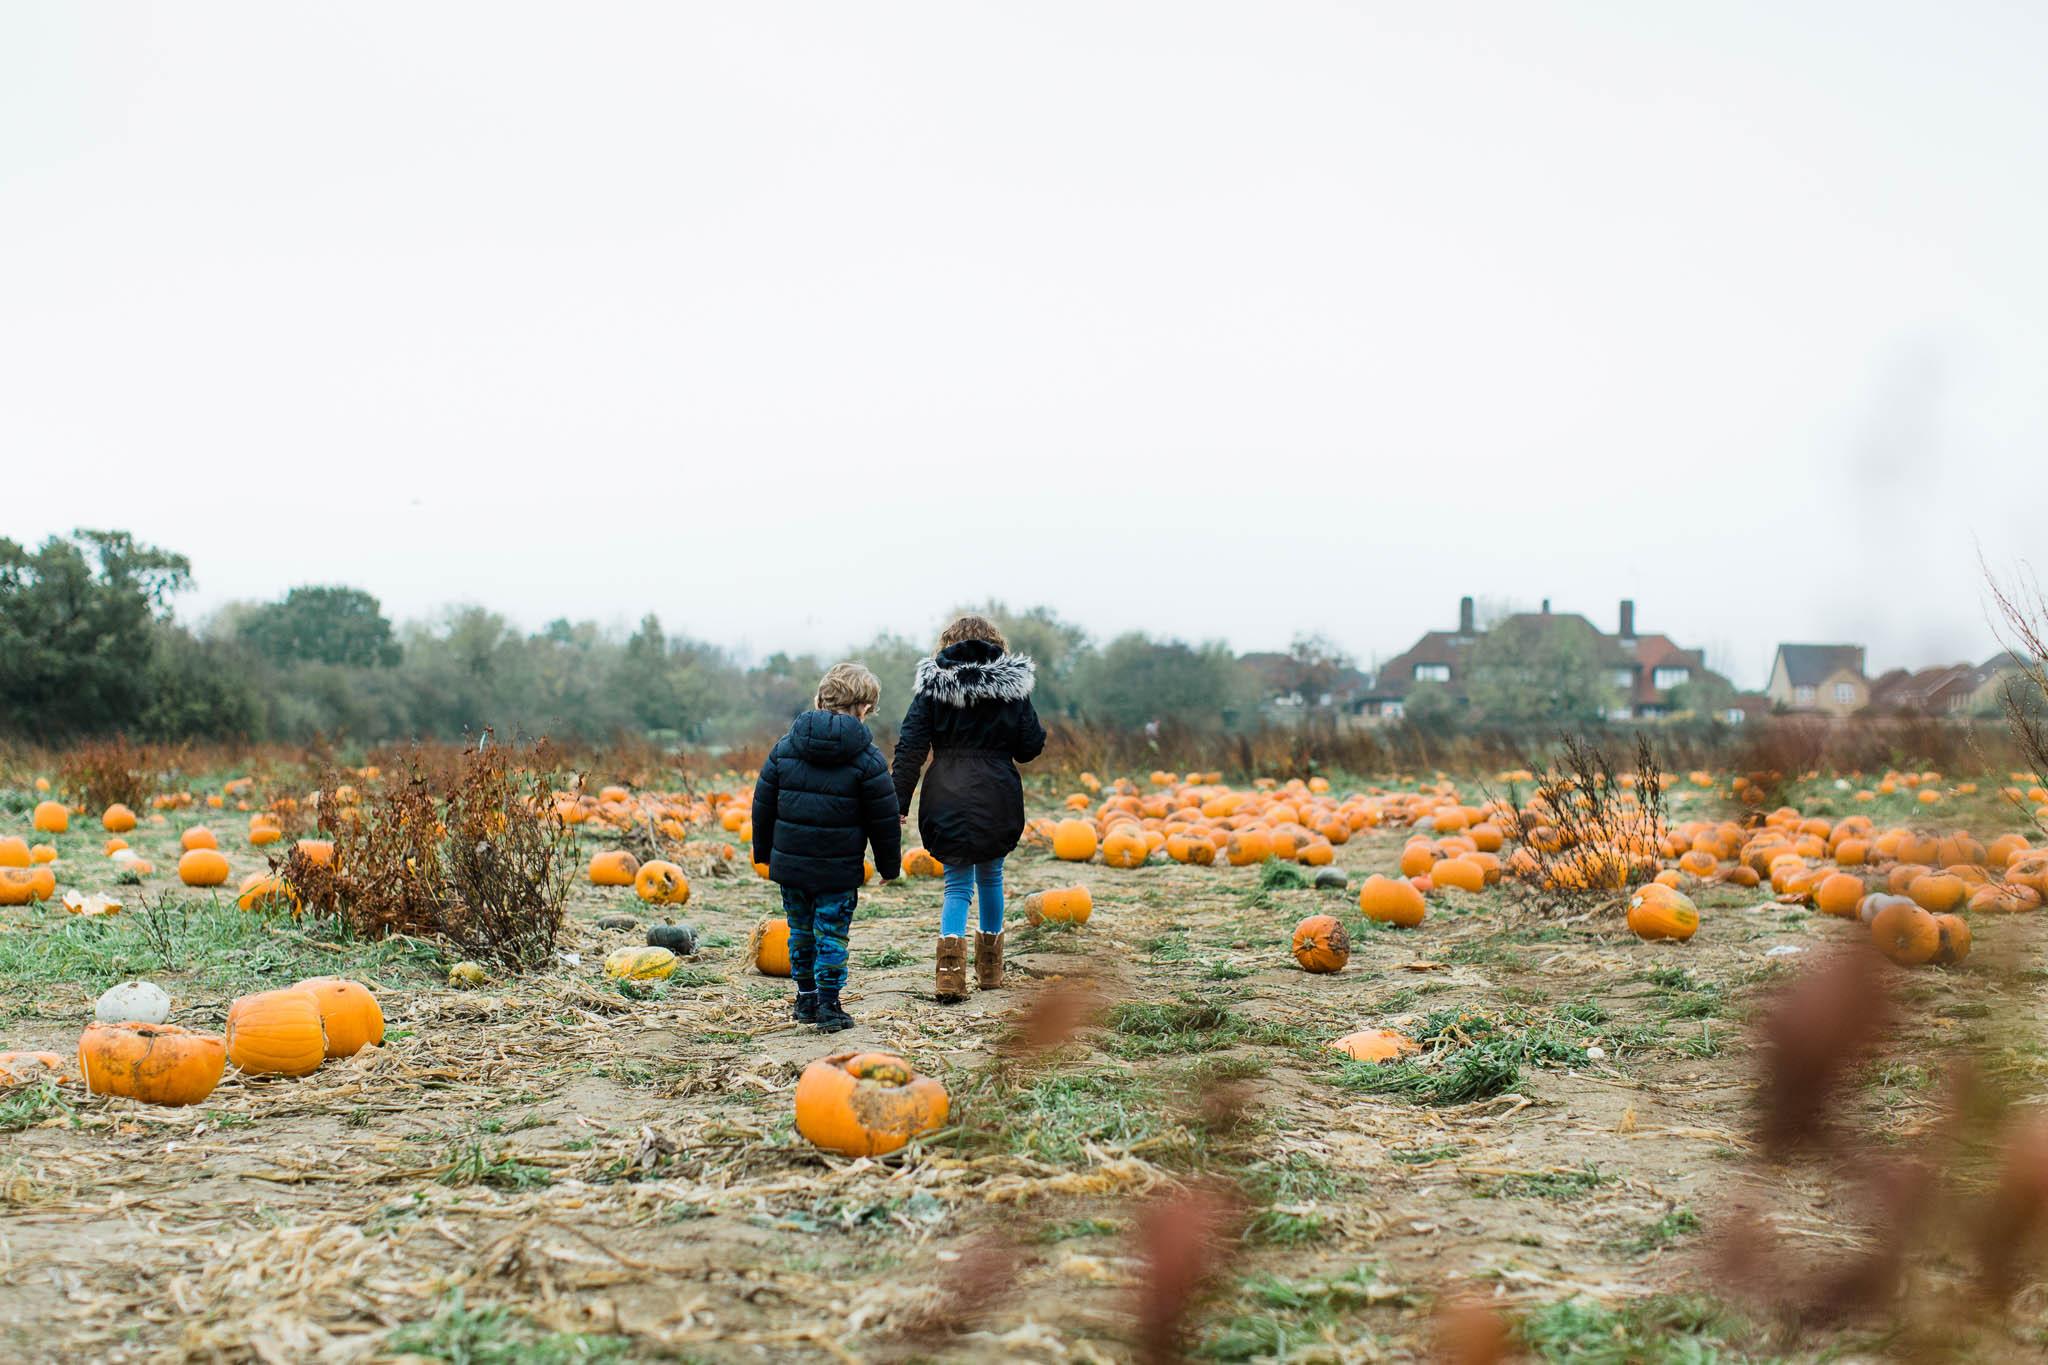 family photo at pumpkin picking farm